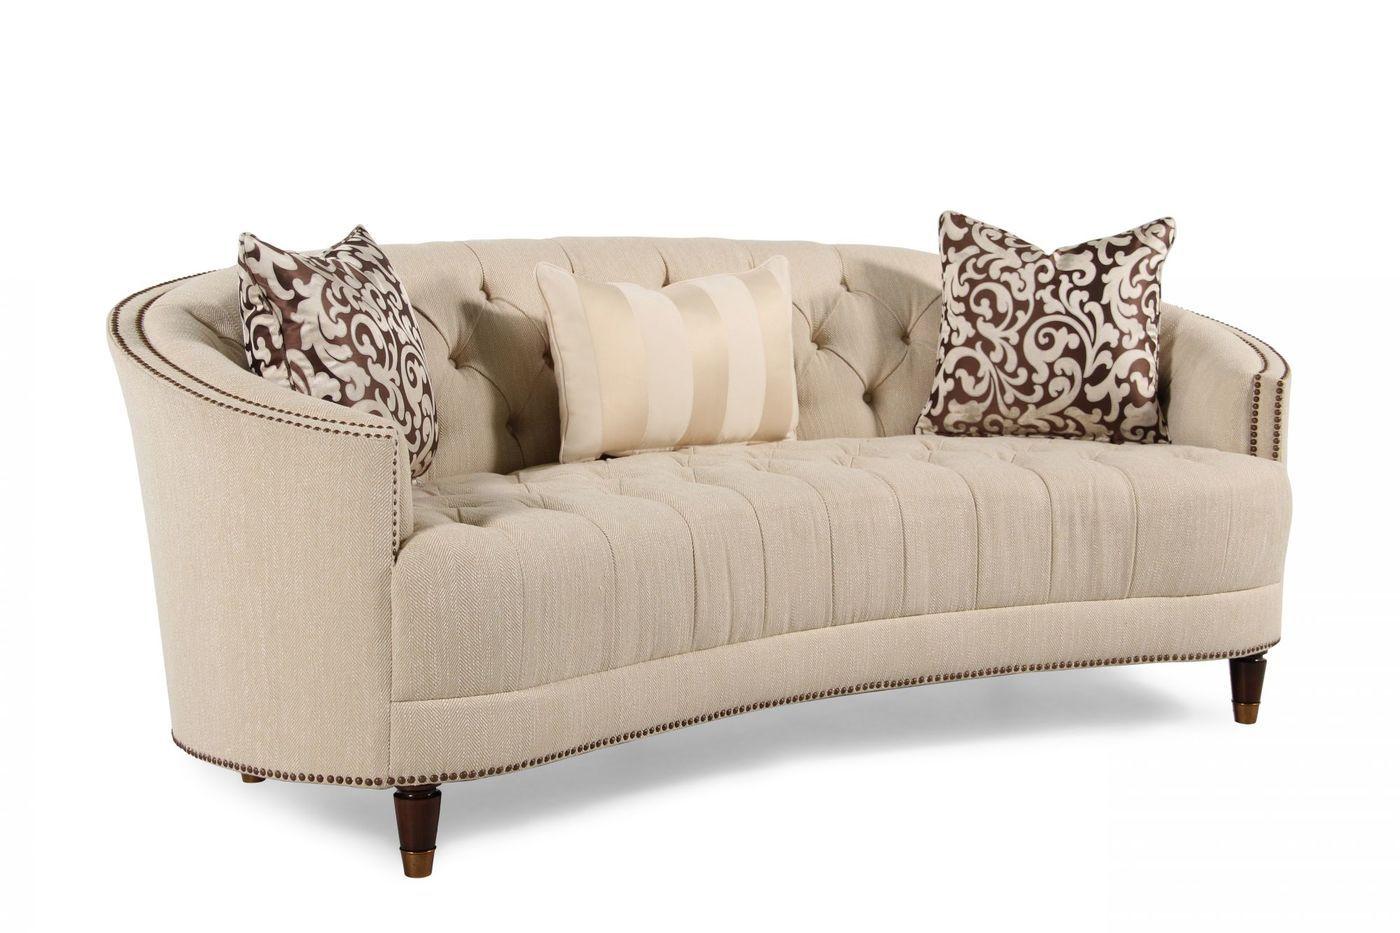 Caracole Classic Elegance Sofa | Mathis Brothers Furniture | 5A ...